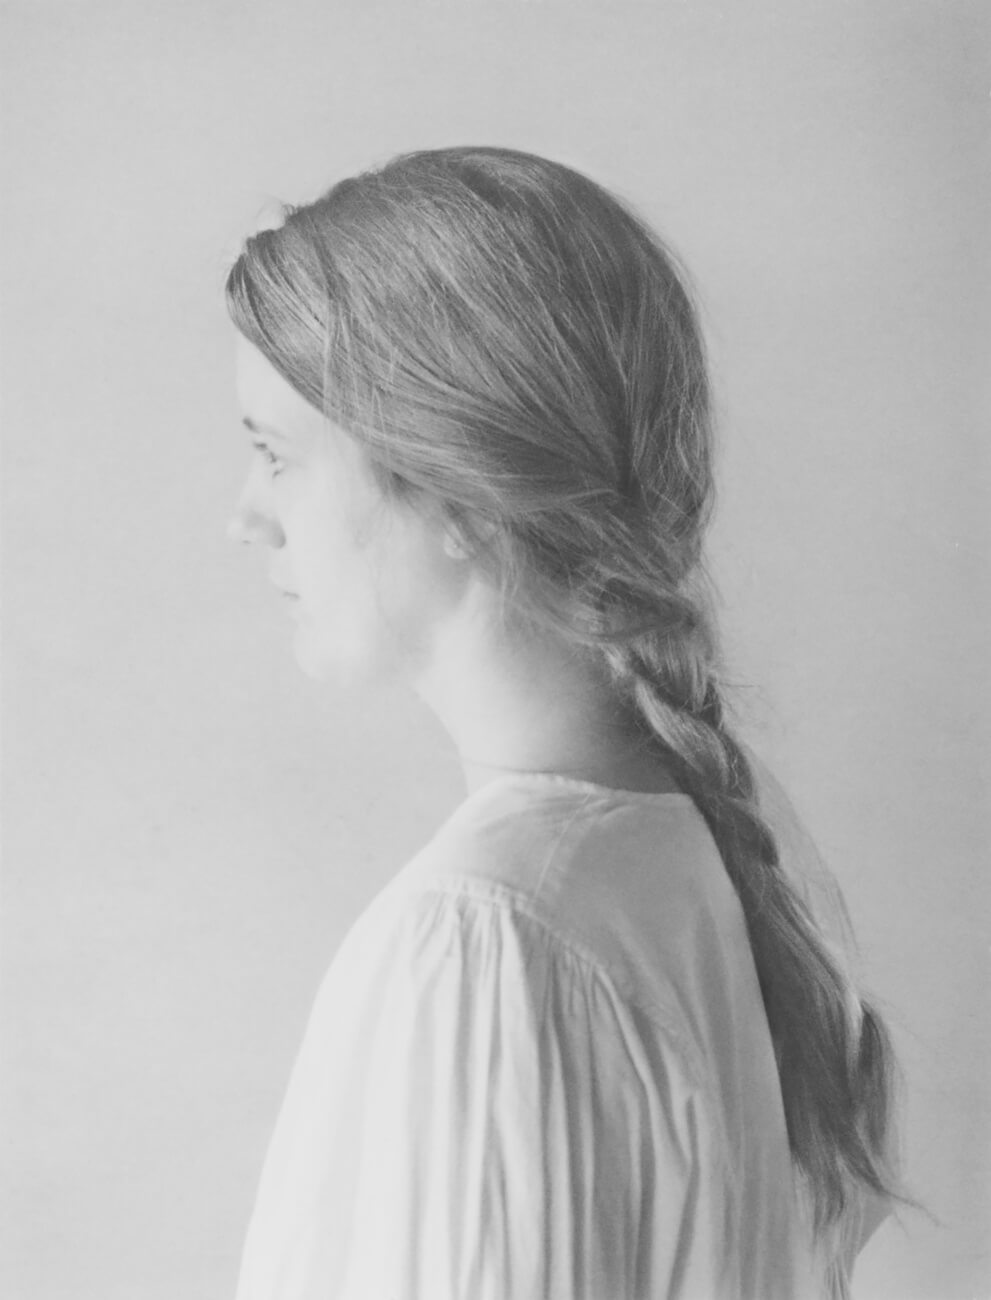 Ruth Lauer Manenti